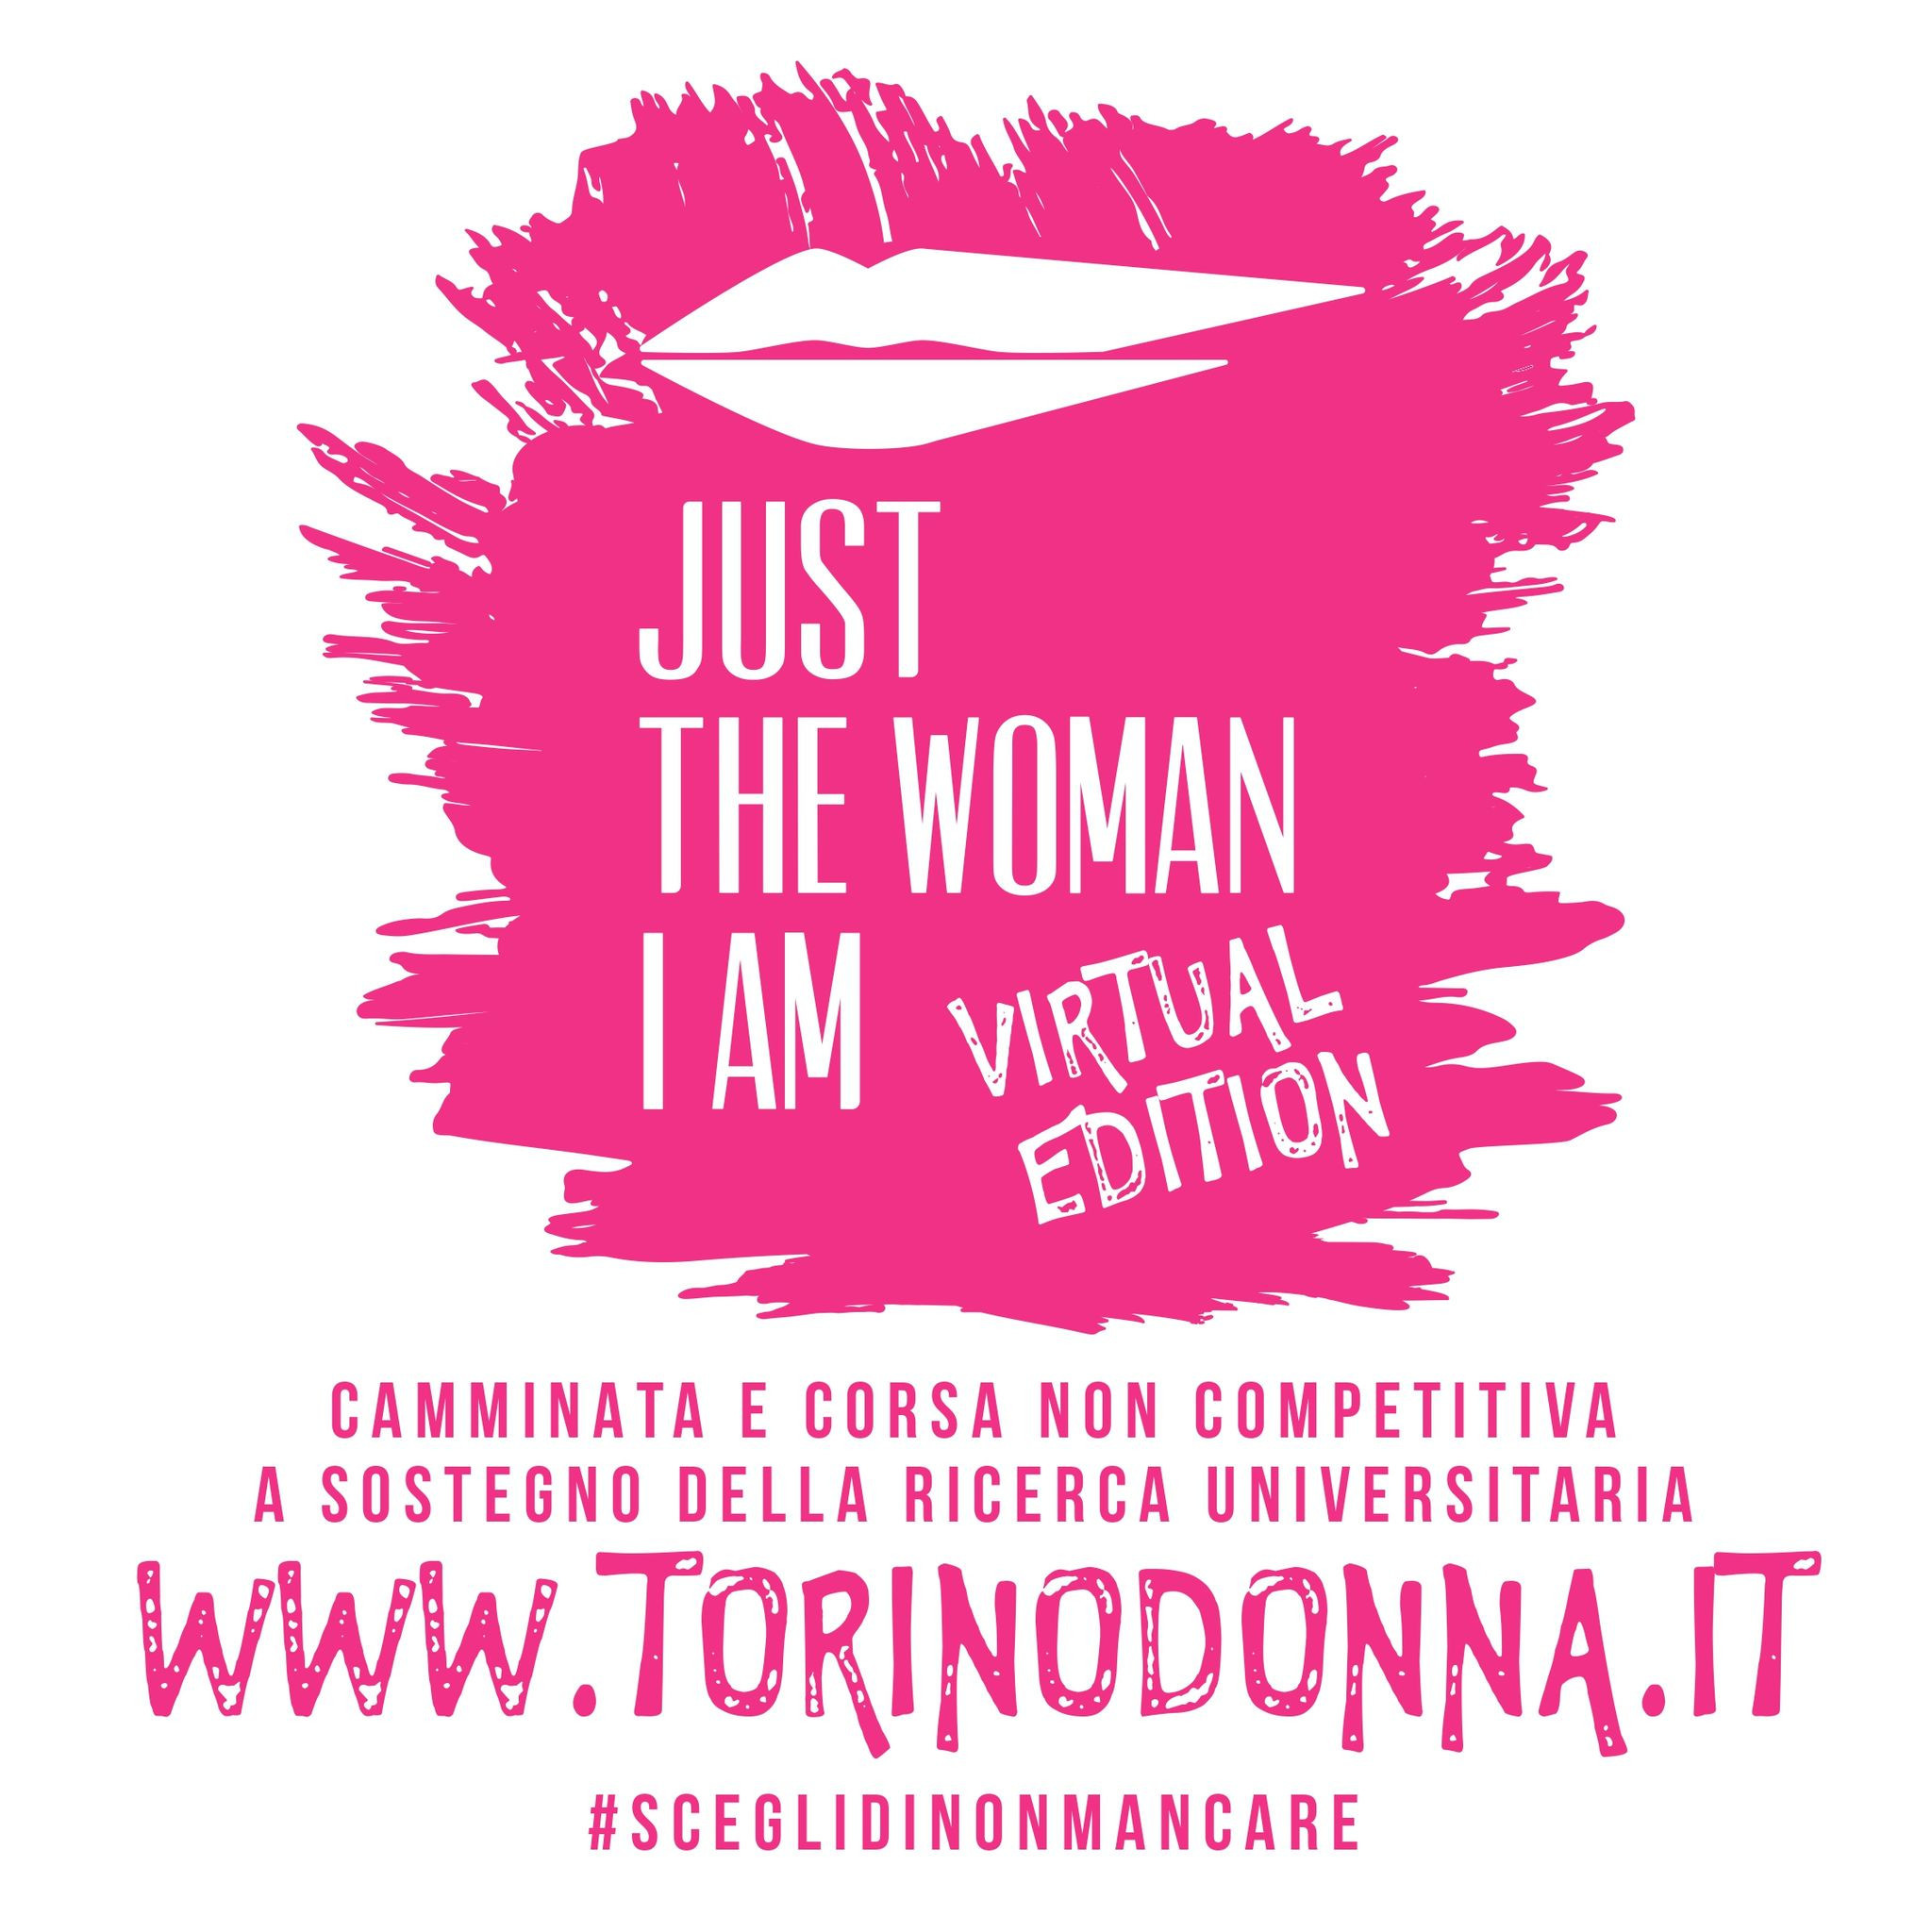 University Sport Center of Turin organises virtual event for International Women's Day